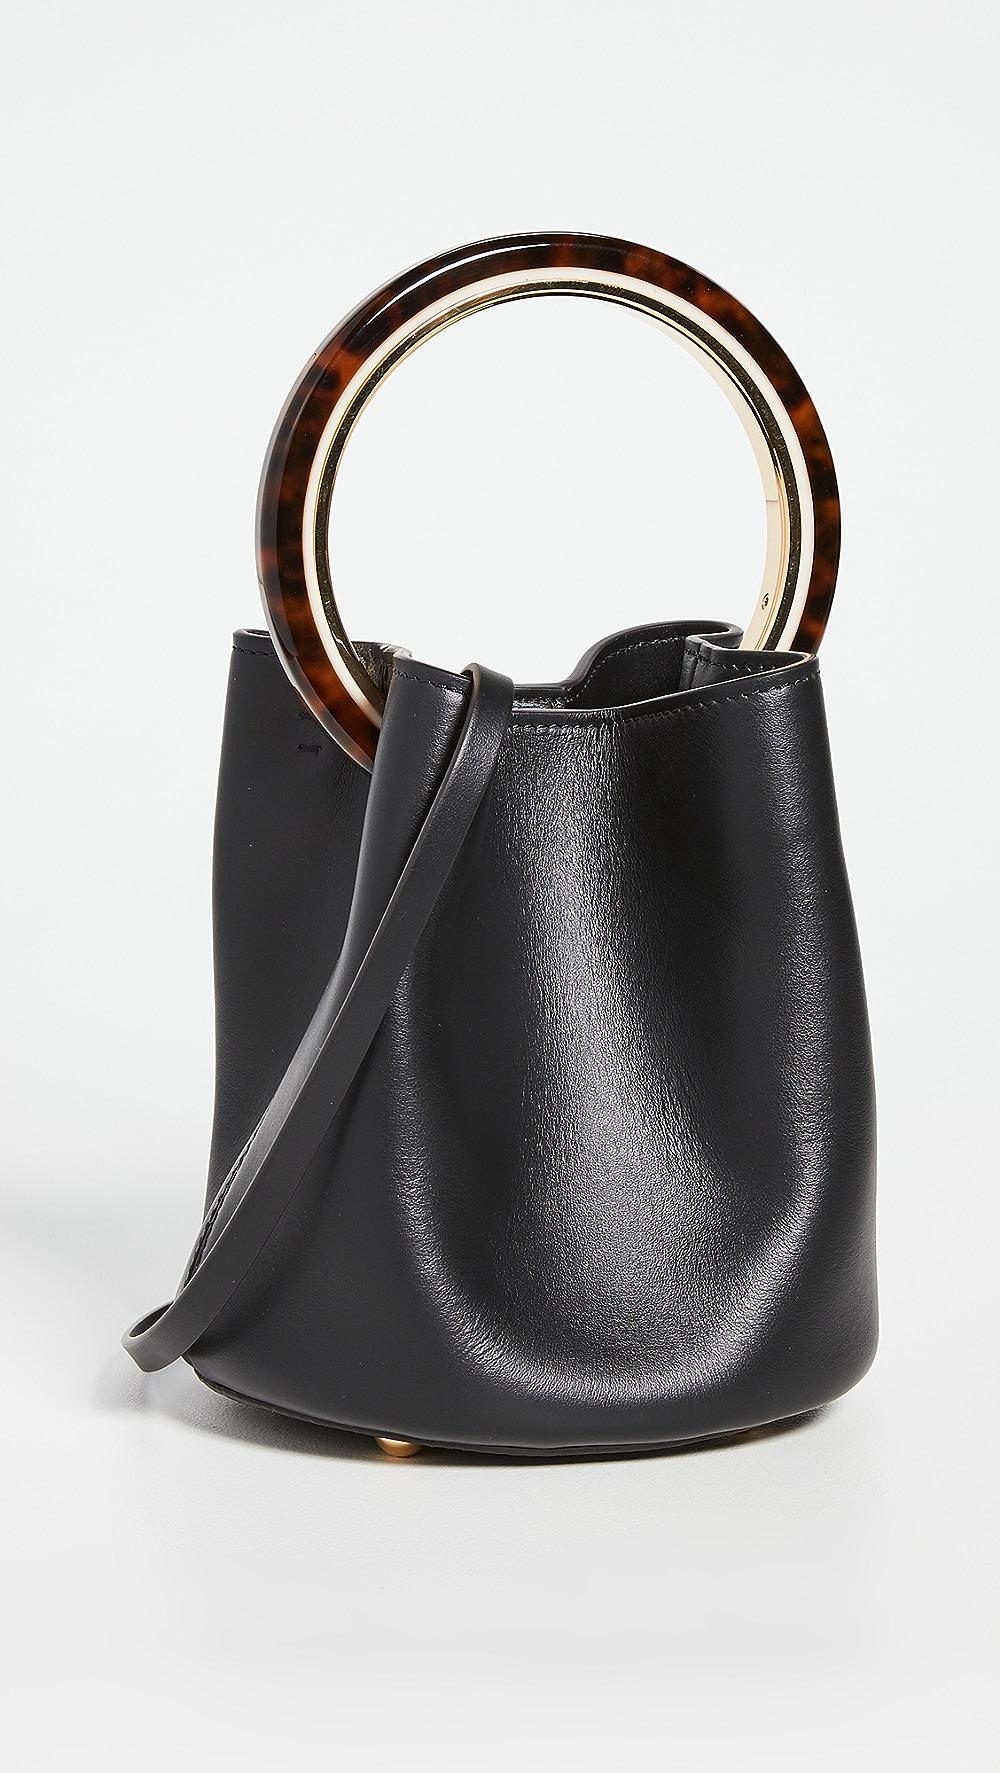 Bright Marni - Pannier Bucket Bag To Enjoy High Reputation In The International Market